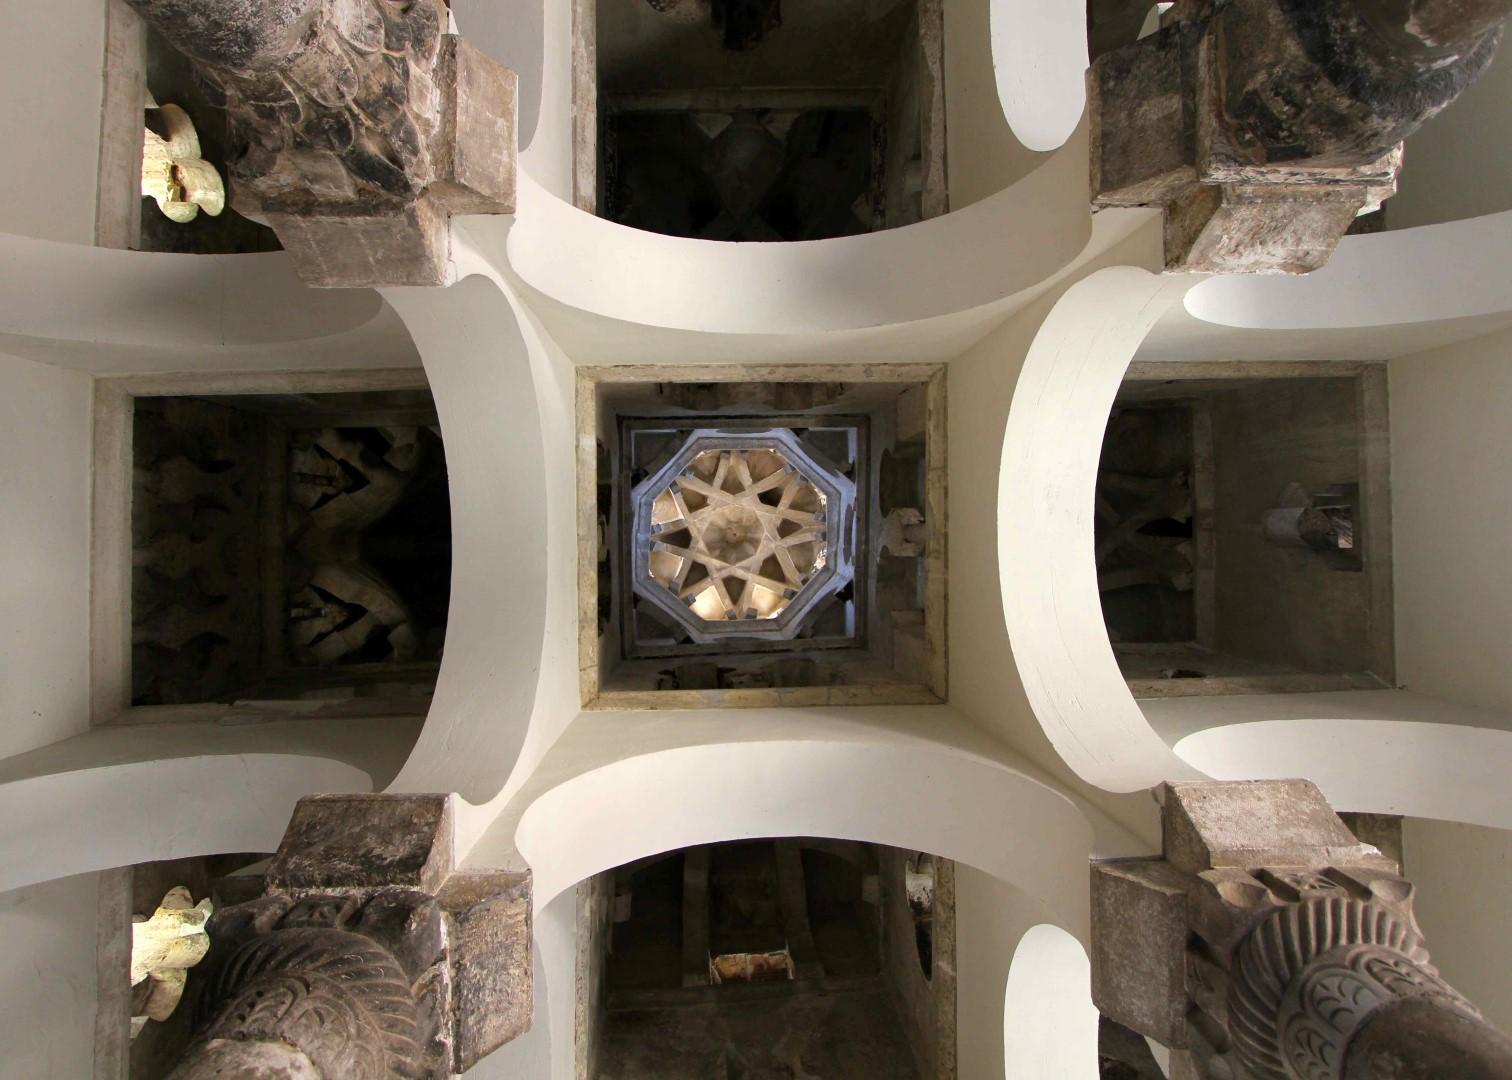 Mezquita Cristo de la Luz, Mudejar, Toledo, Spain, Travelers Roundtable, Robert Bundy